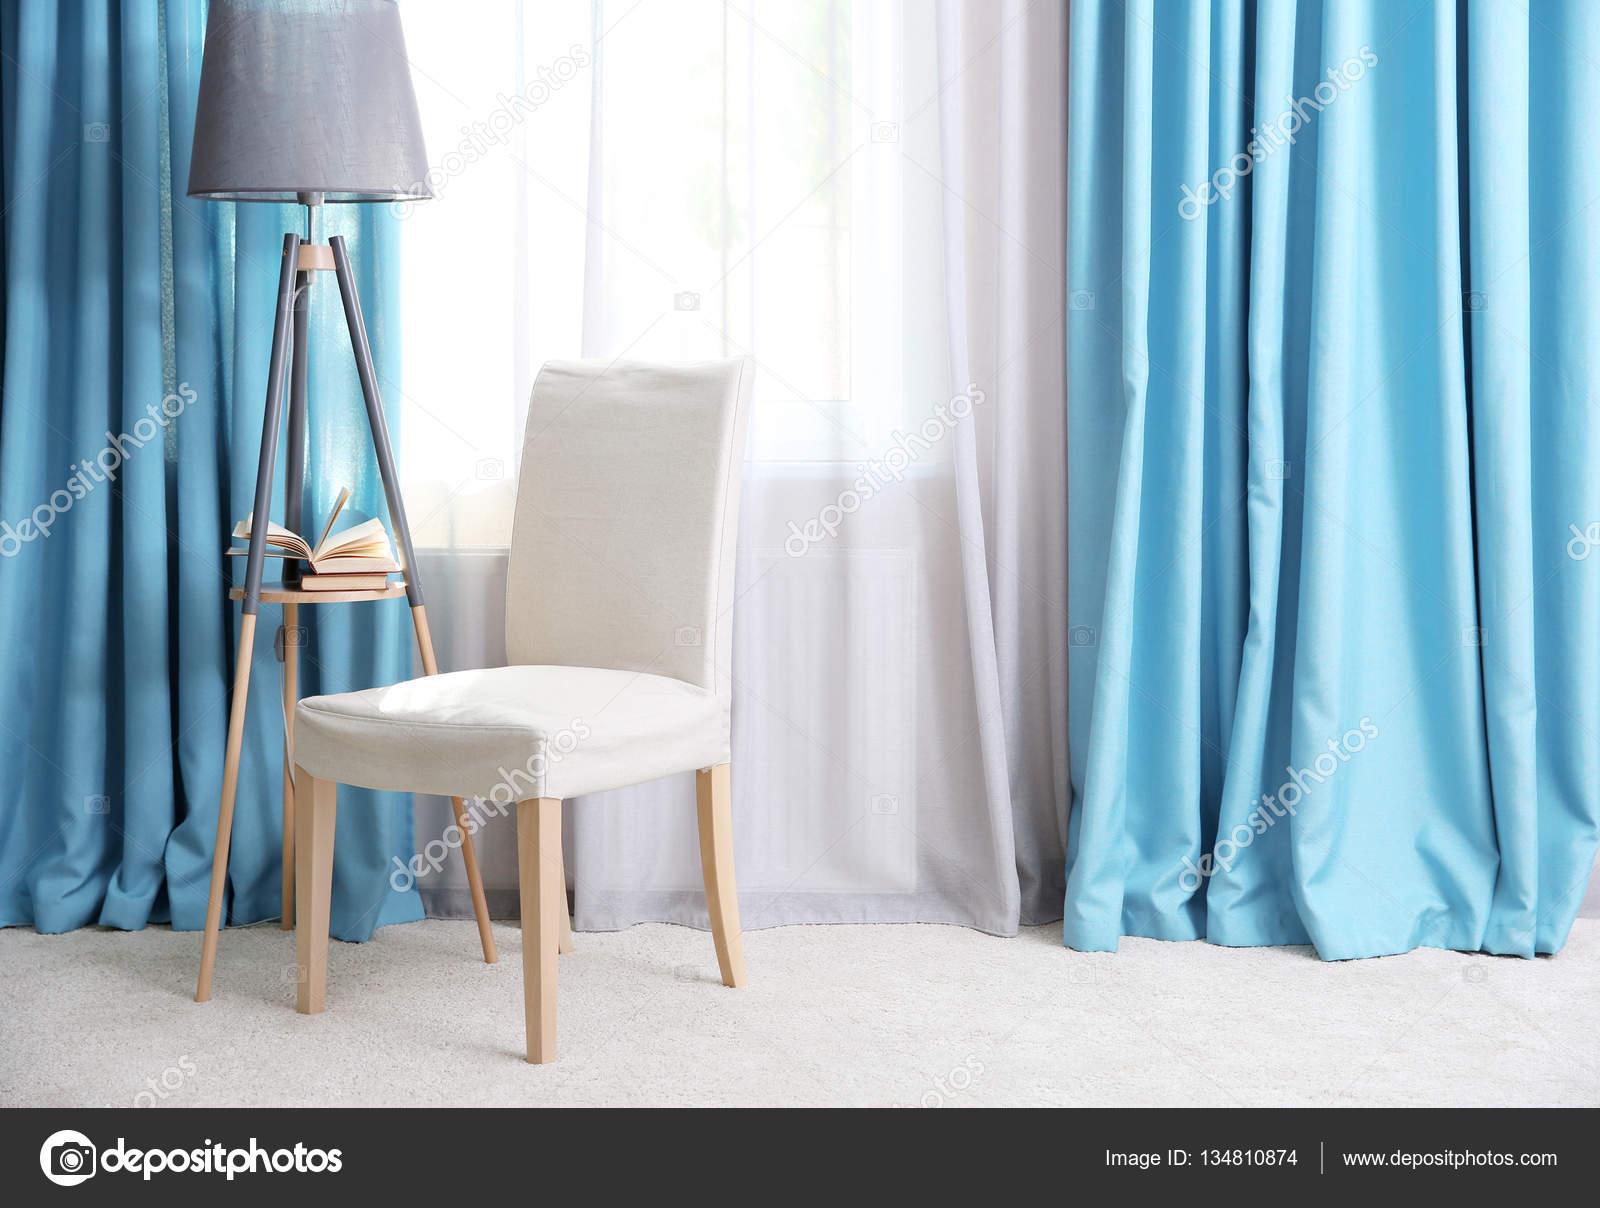 Living comedor con cortinas modernas foto de stock - Cortinas comedor modernas ...